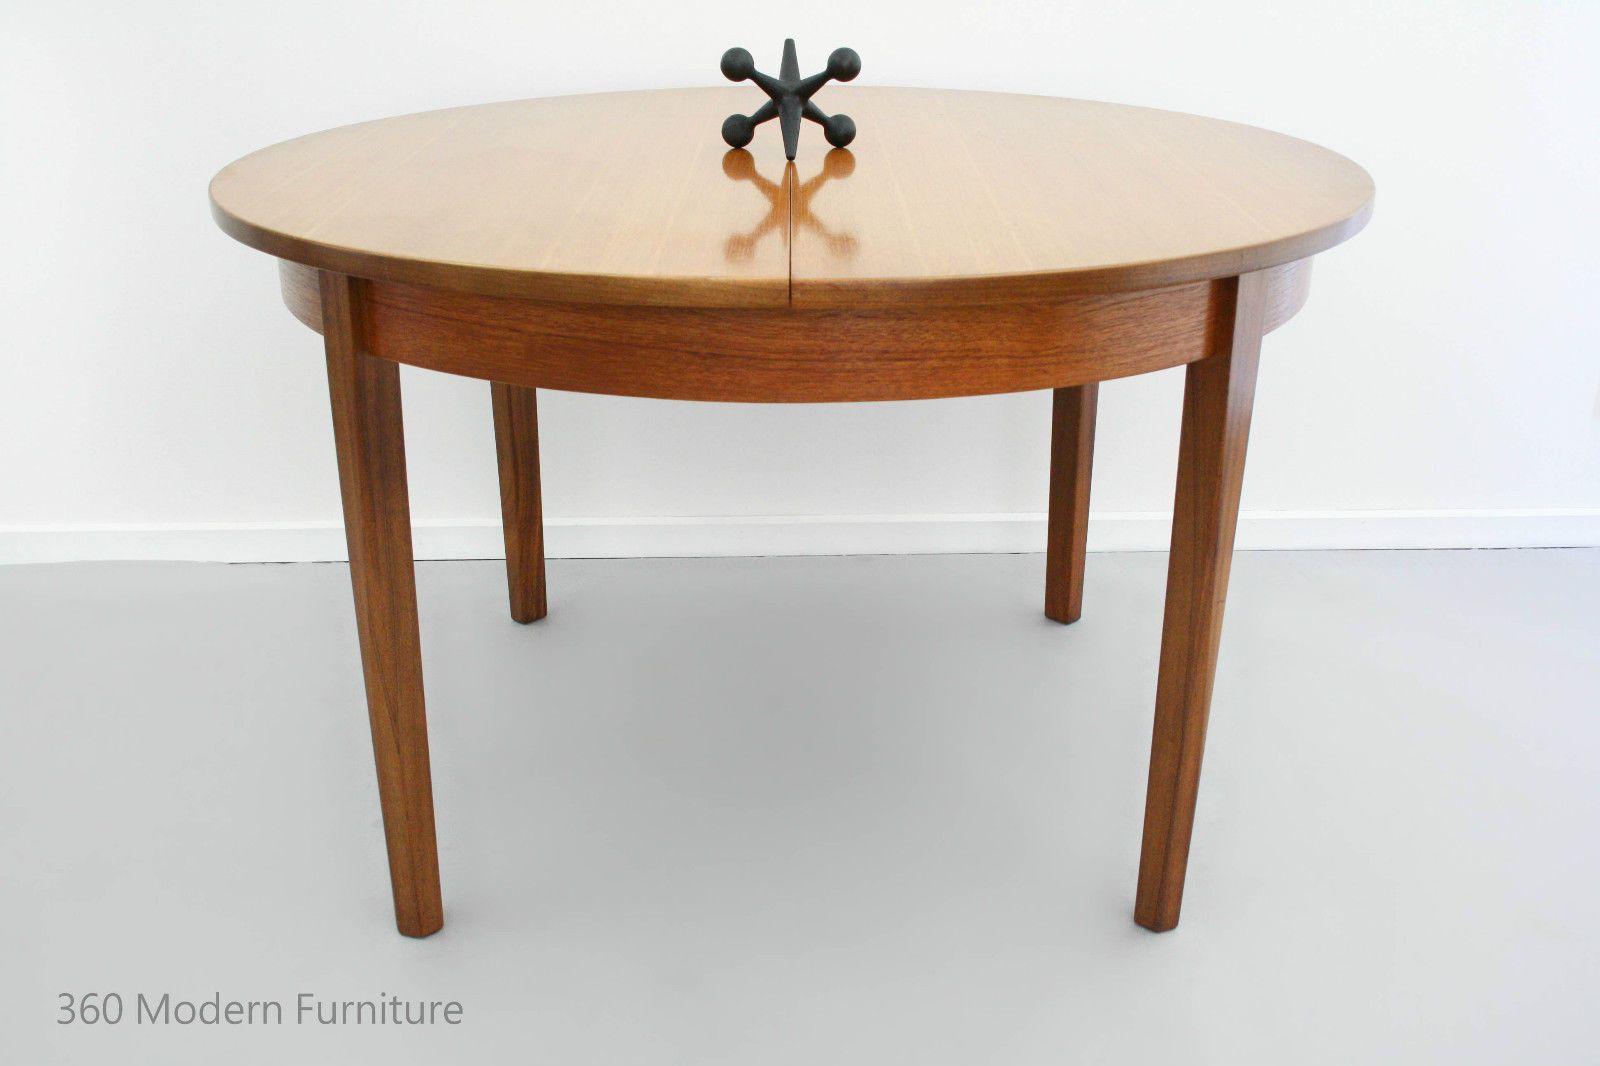 Mid Century Extension Dining Table William Lawrence Nottingham Uk Seats 4 6 Vintage Retro Teak Scandi Modern Furniture Mid Century Dining Mid Century Furniture